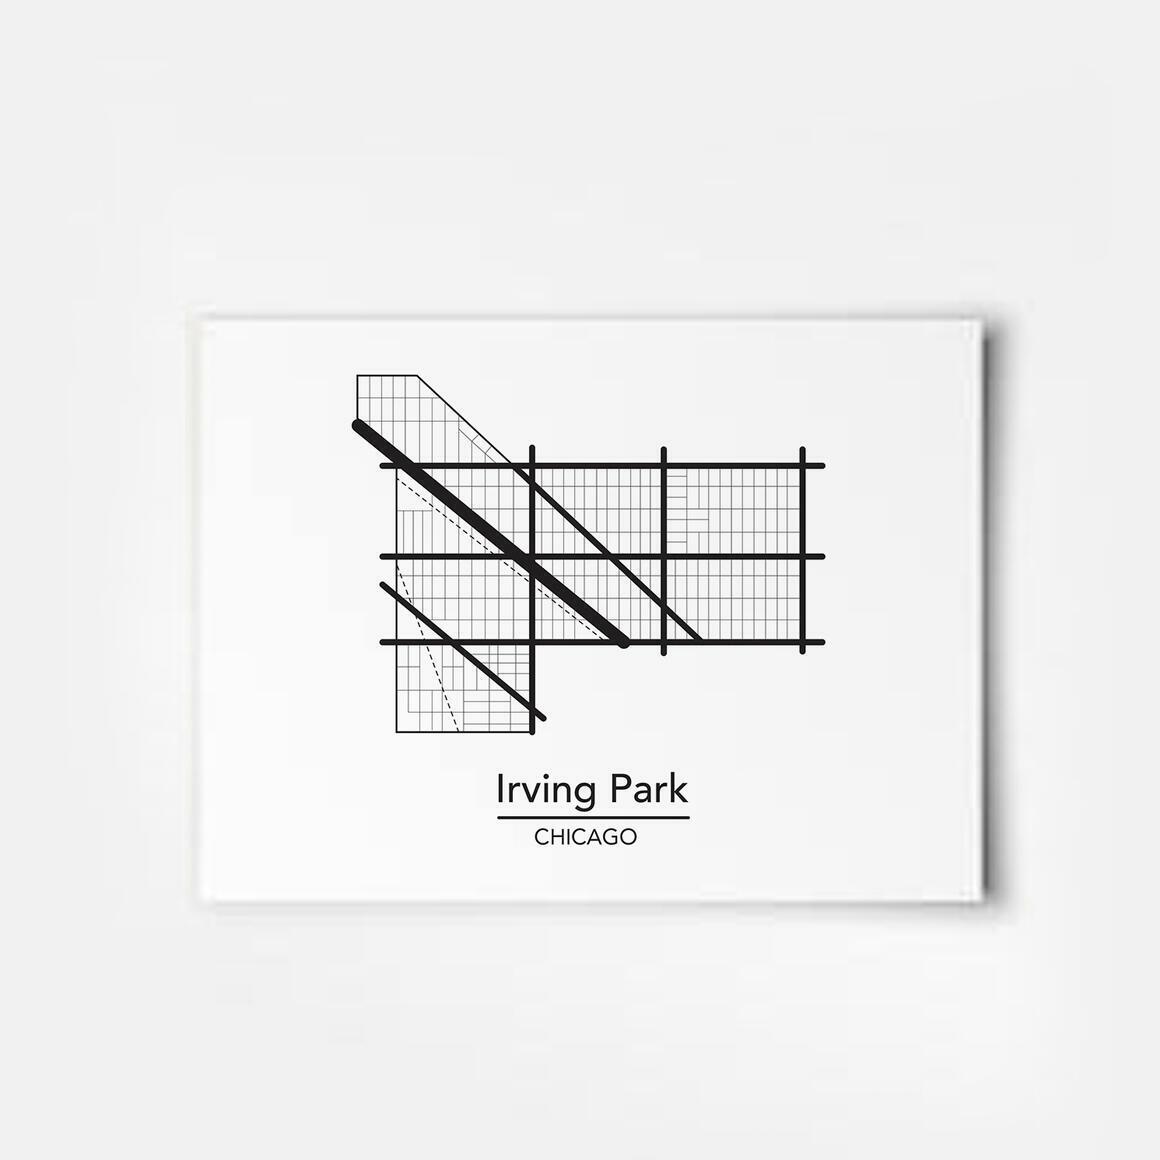 Irving Park - Chicago Neighborhood Map Print | Trada Marketplace